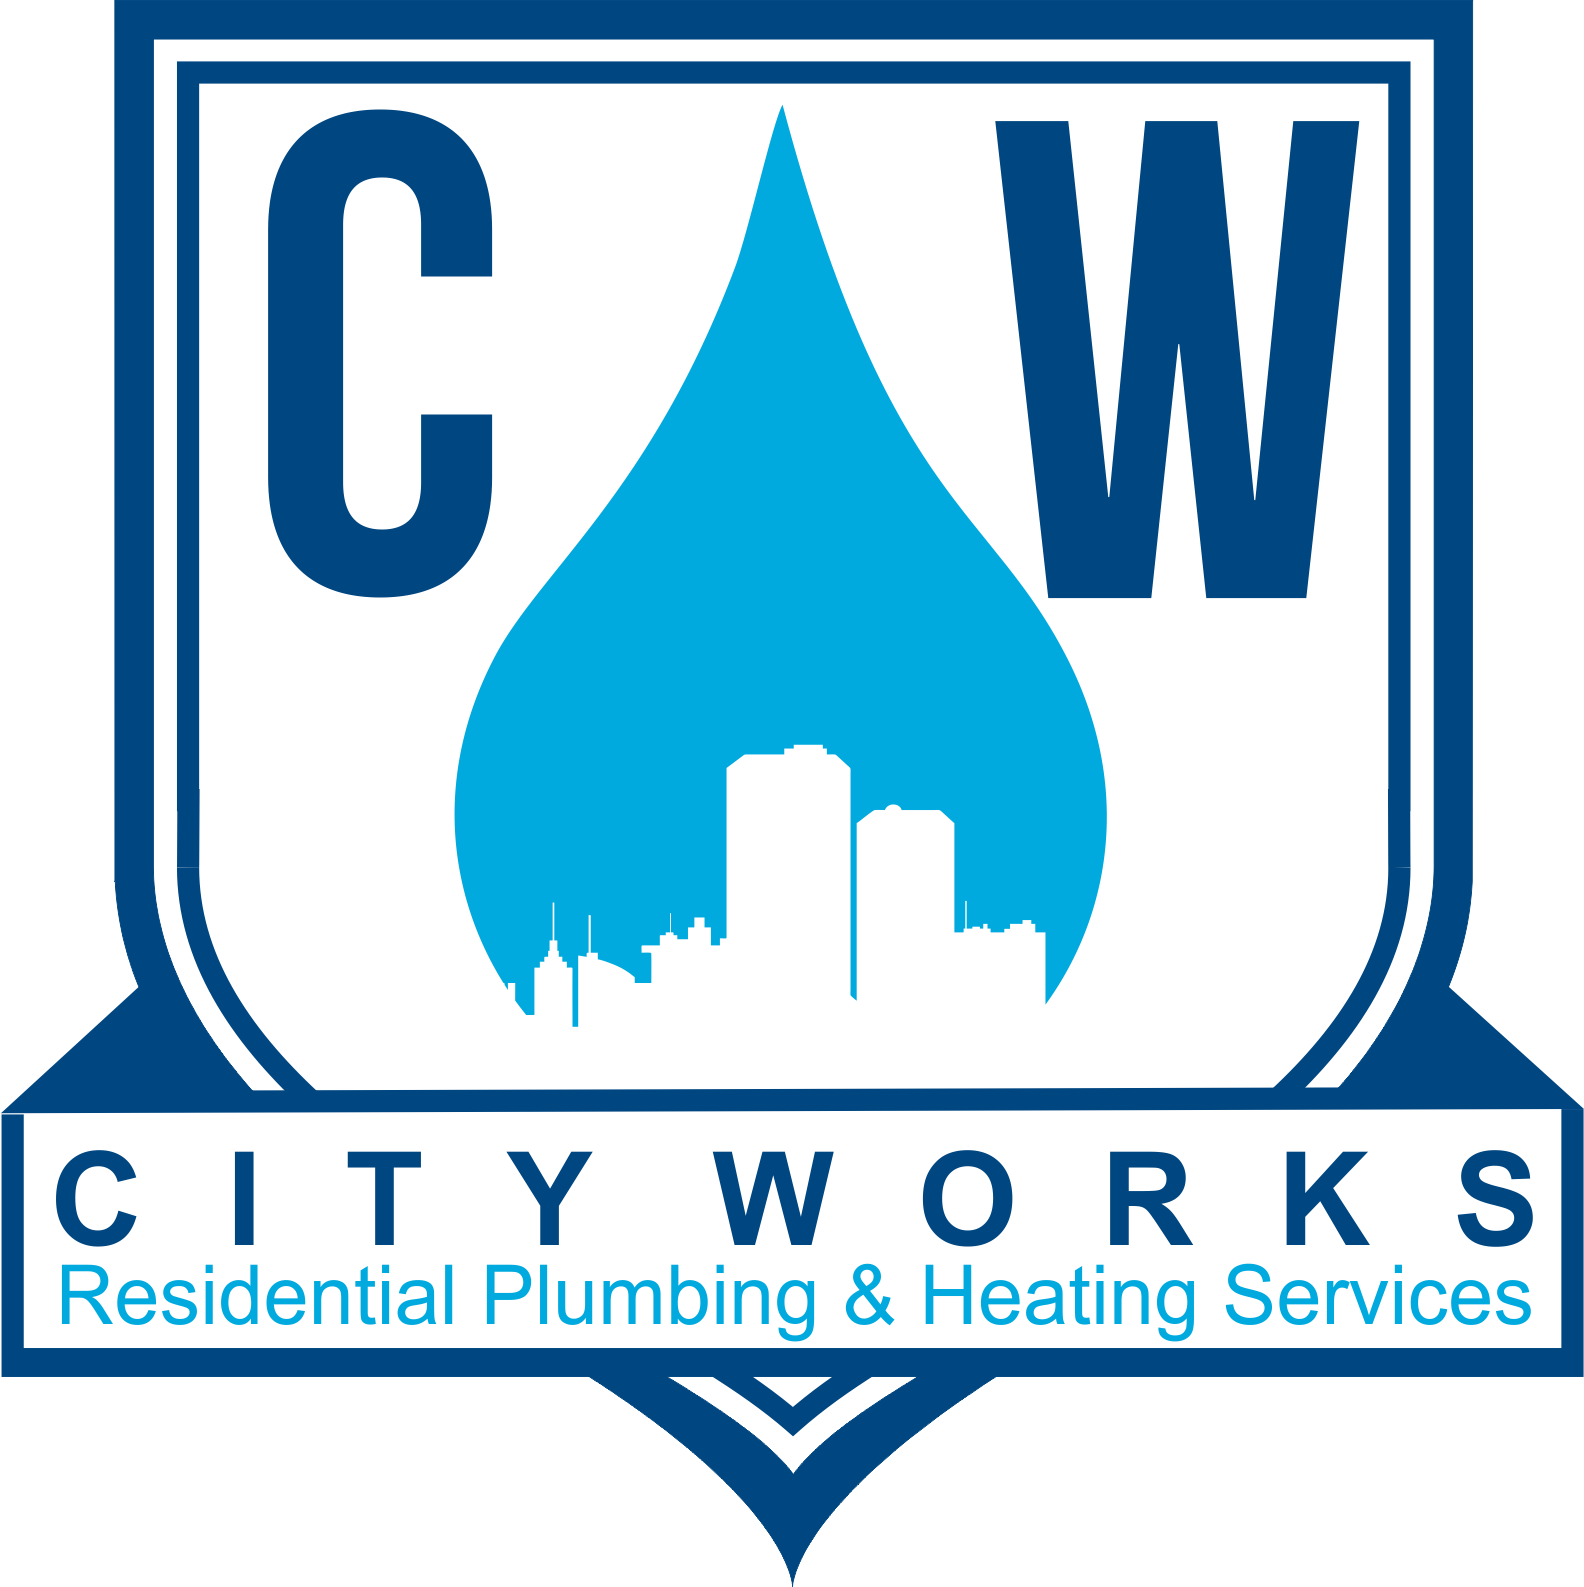 Edmonton Sun | Classifieds | Services | Furnace Repair, Hot Water ...